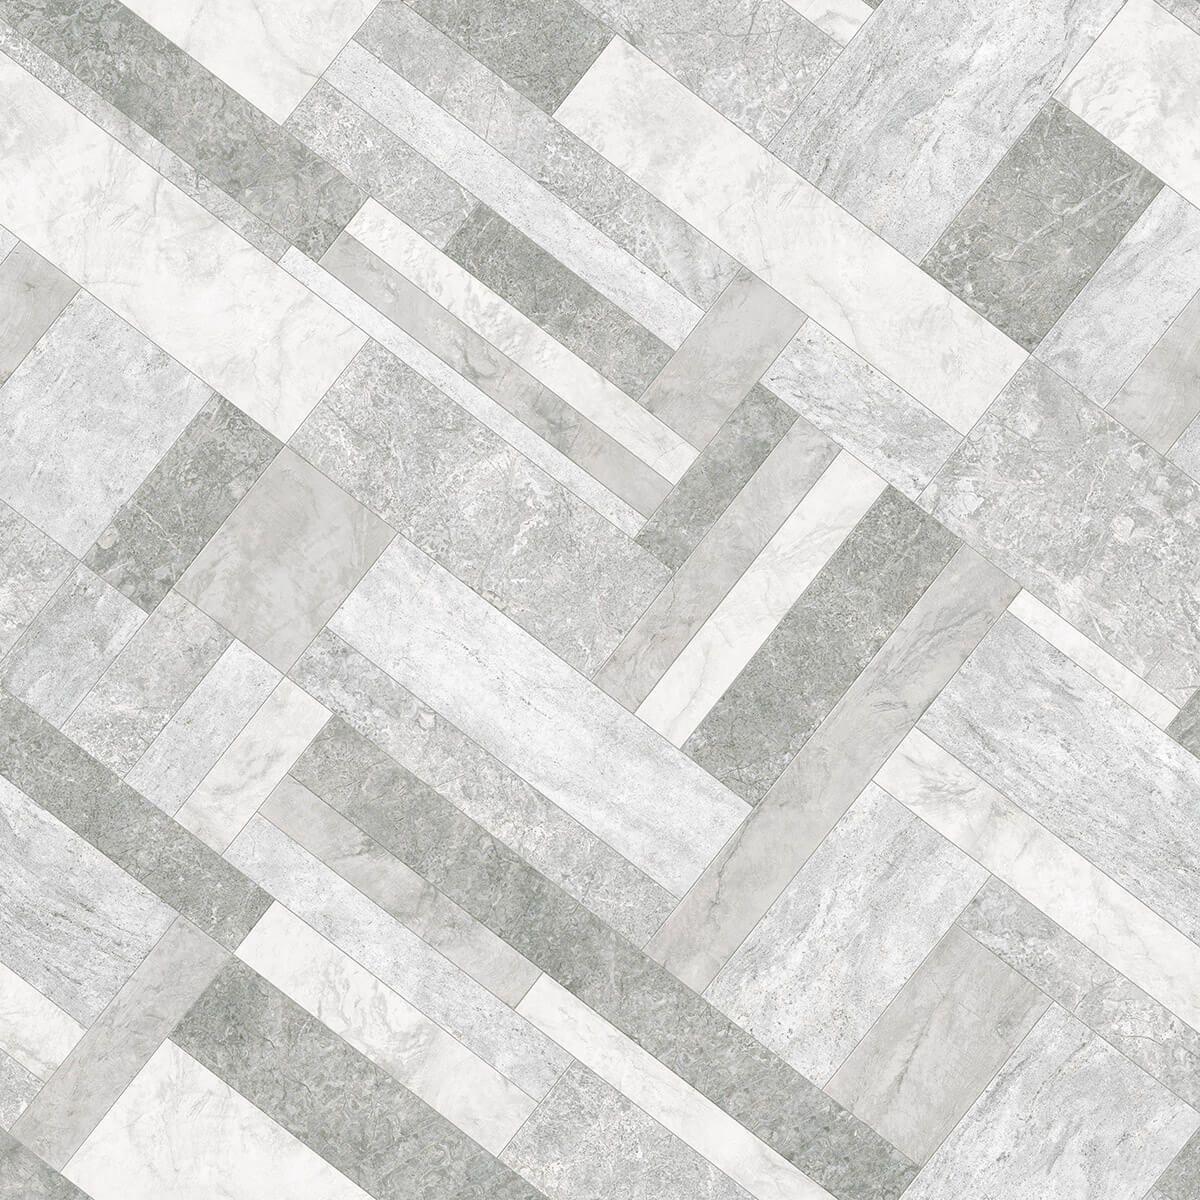 Линолеум Синтерос by Tarkett Bonus Tesco 3